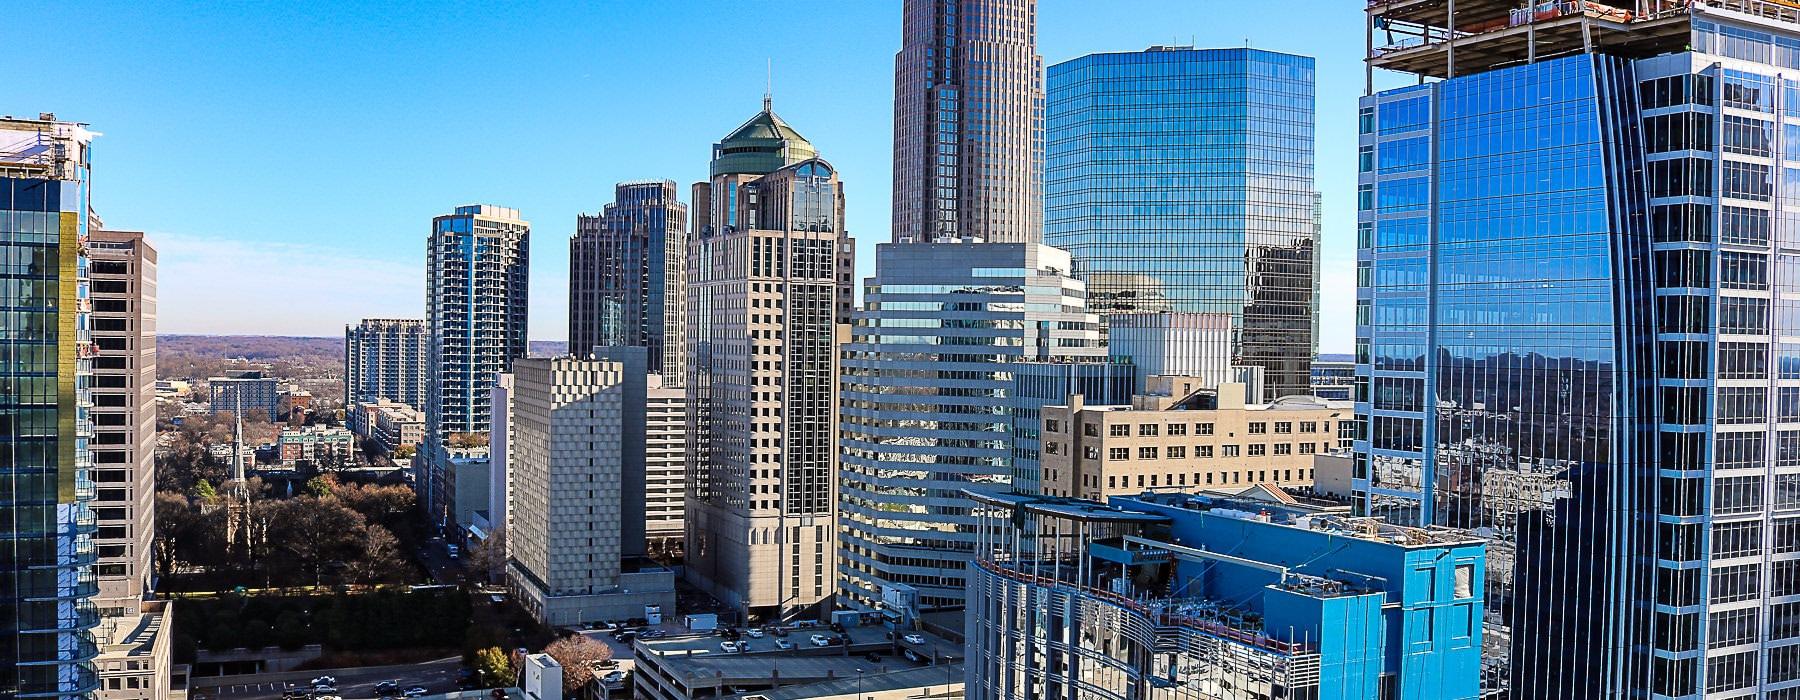 views of downtown Charlotte, NC